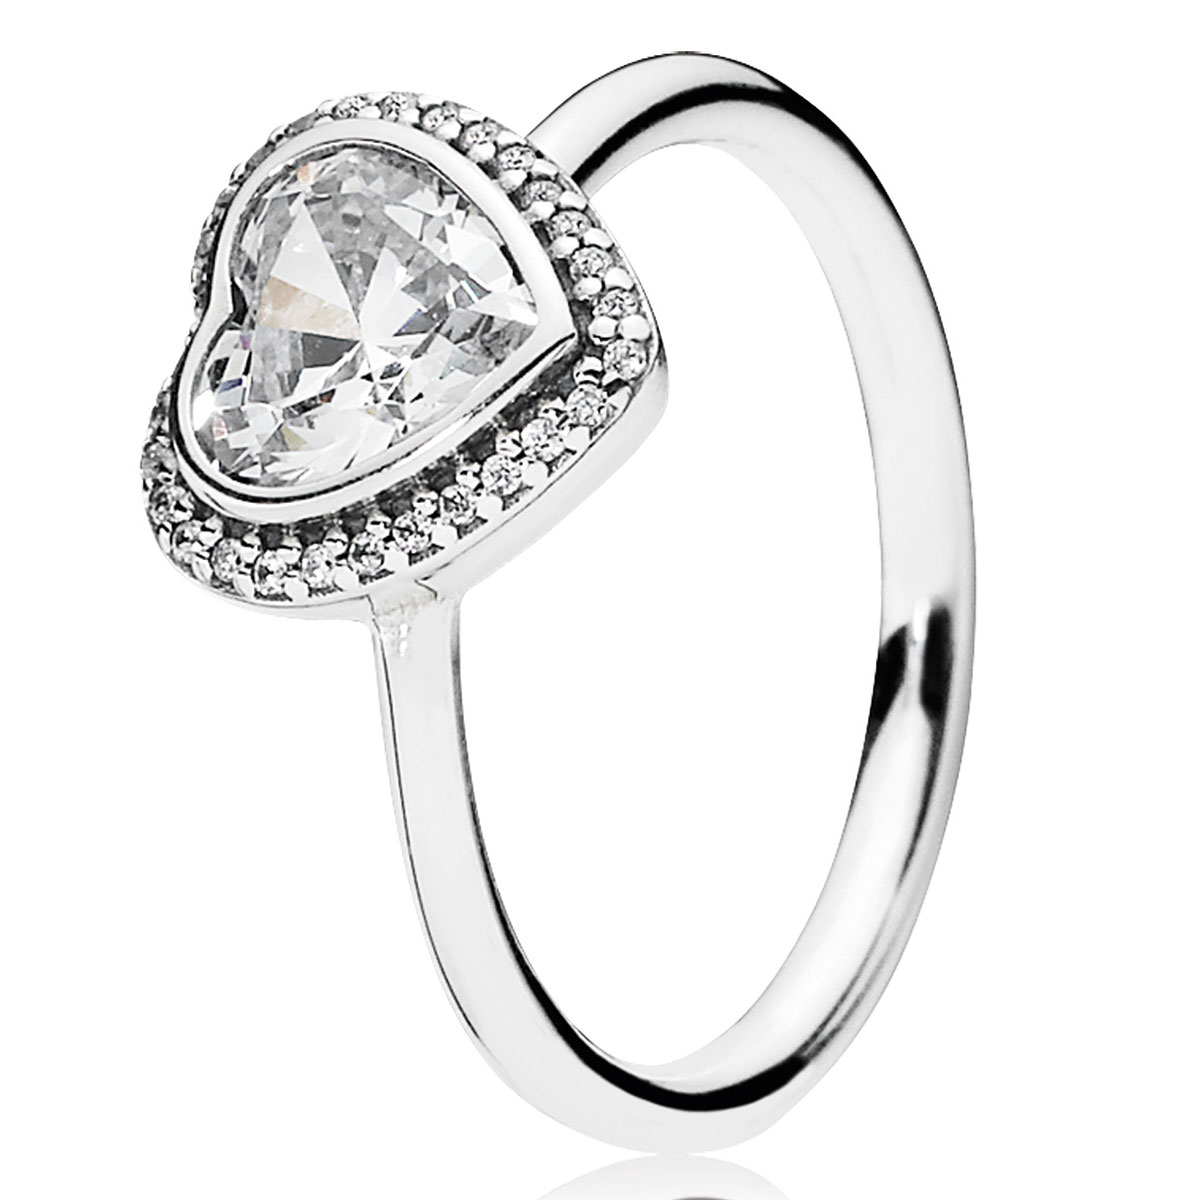 PANDORA Sparkling Love with Clear CZ Ring - Pancharmbracelets.com